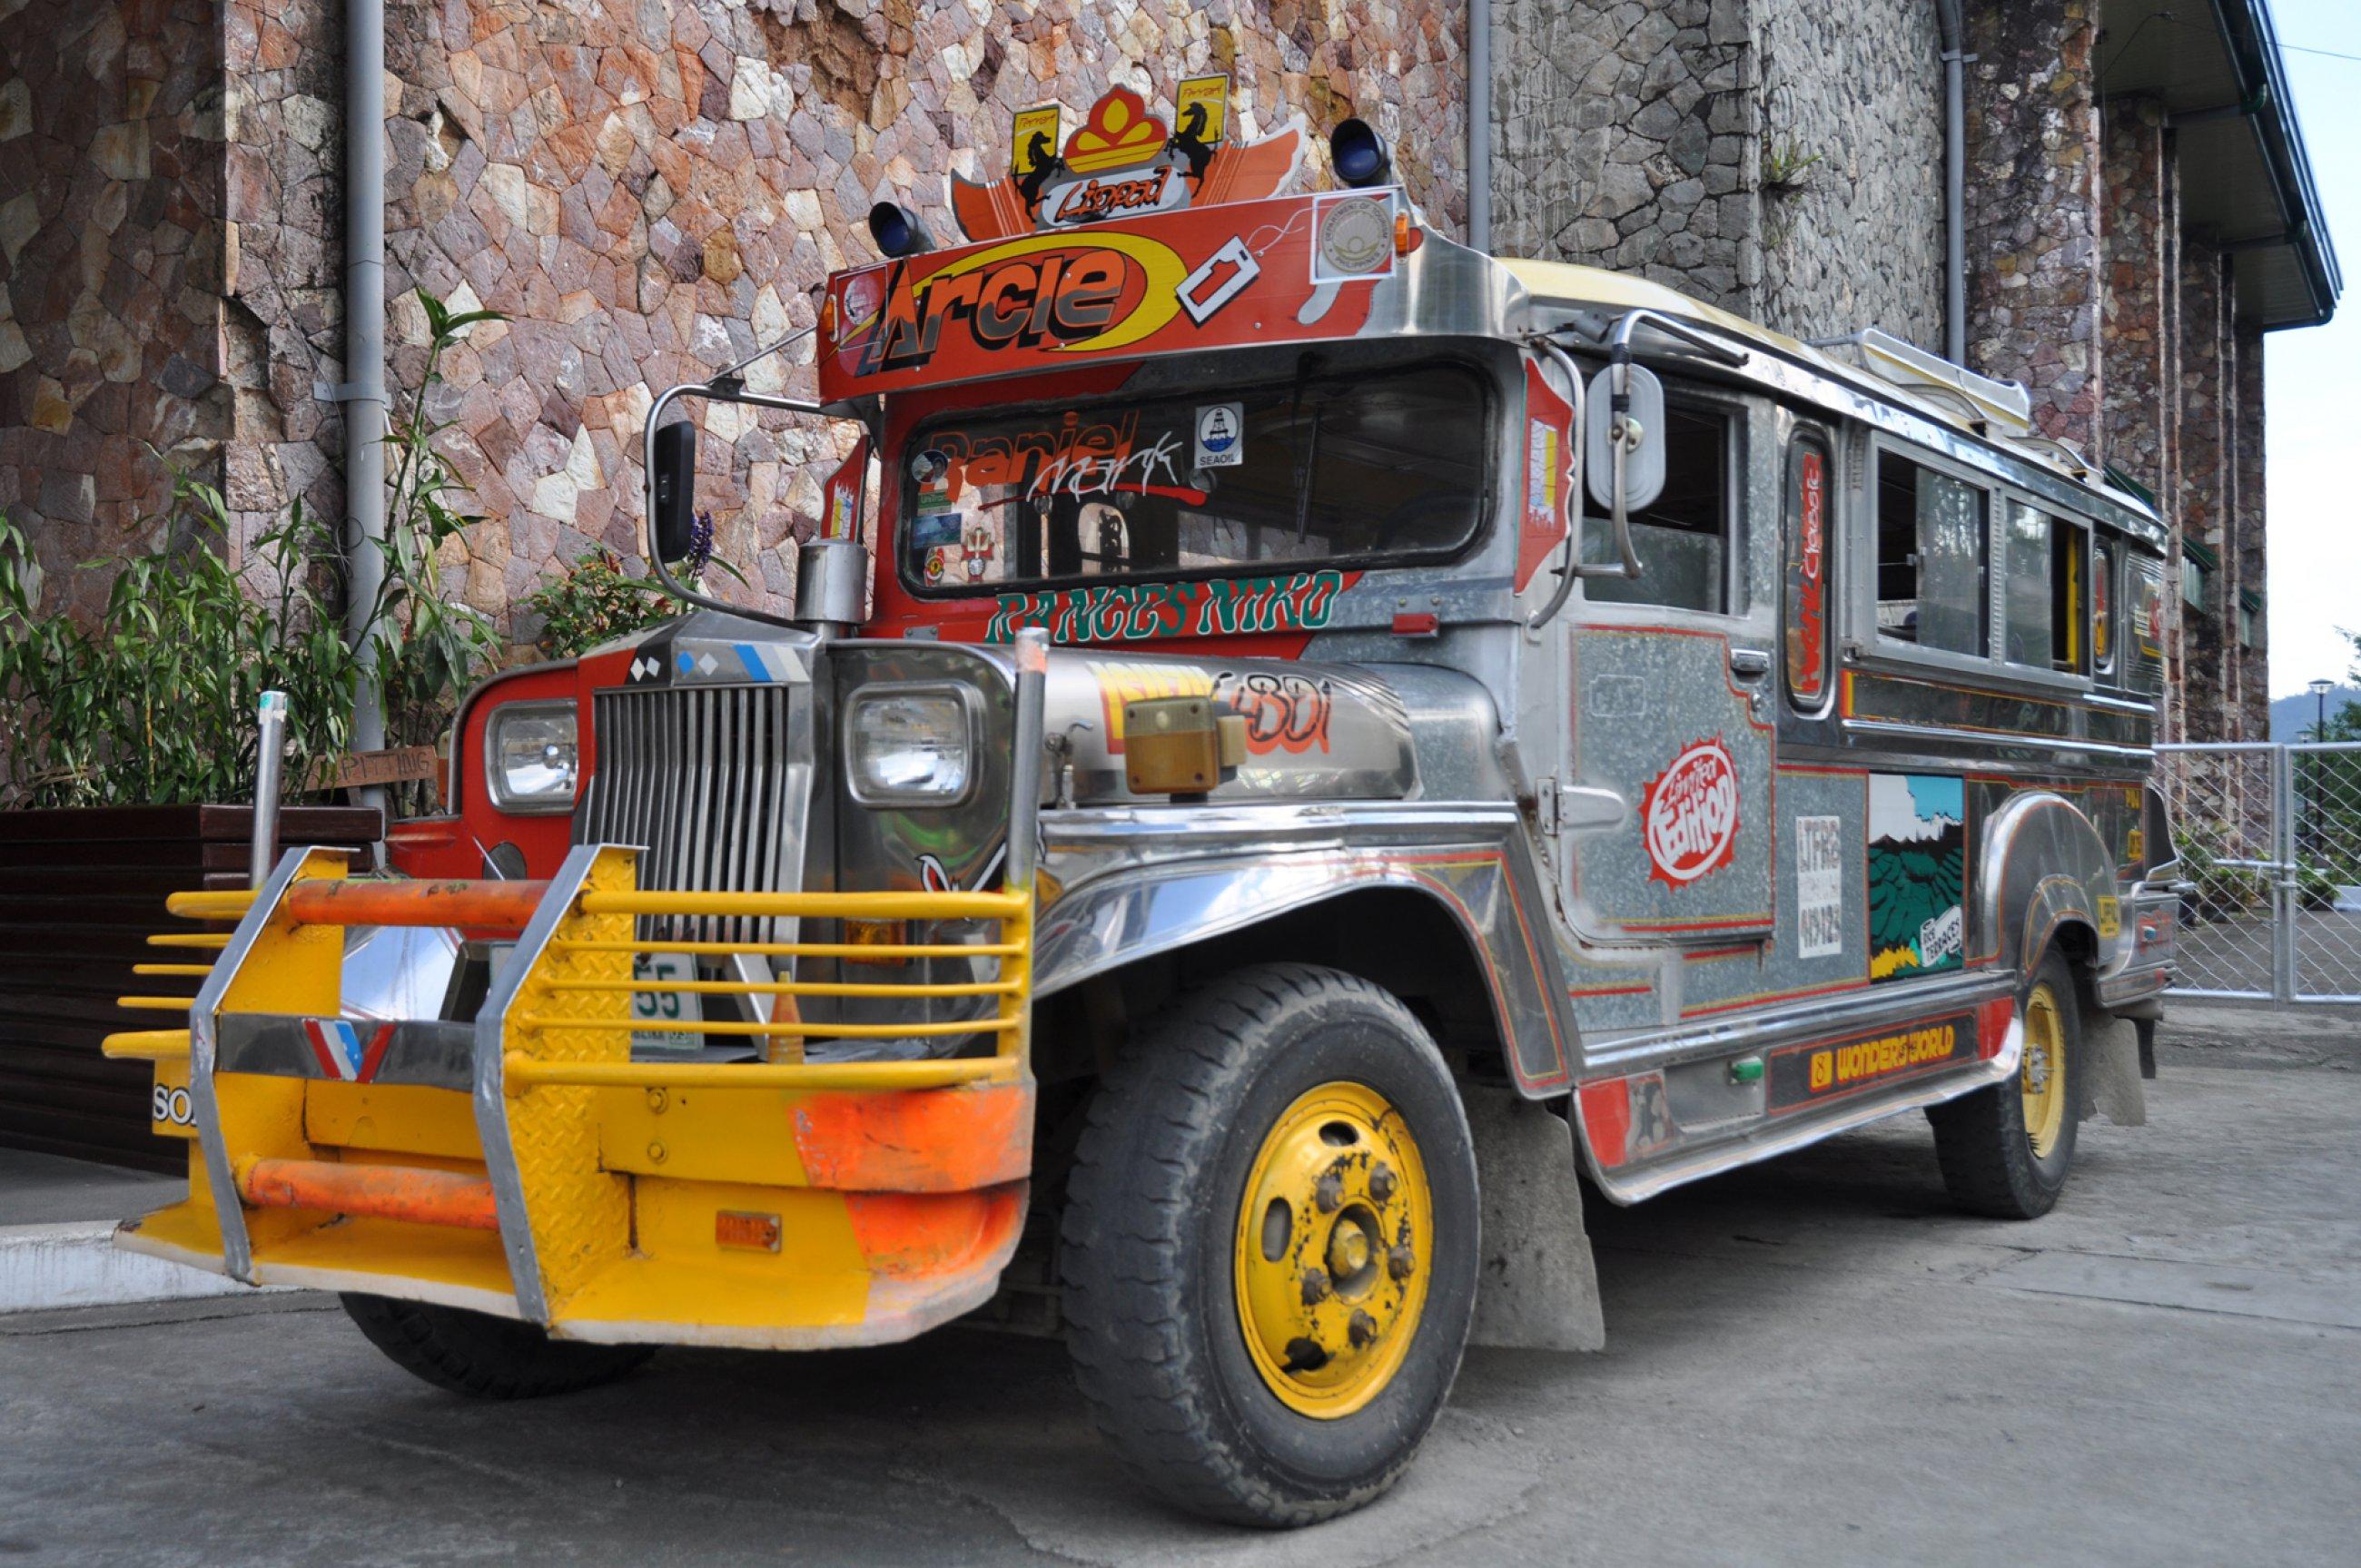 https://bubo.sk/uploads/galleries/4923/filipiny-tomas-kubus-filipiny-2014-2-.jpg